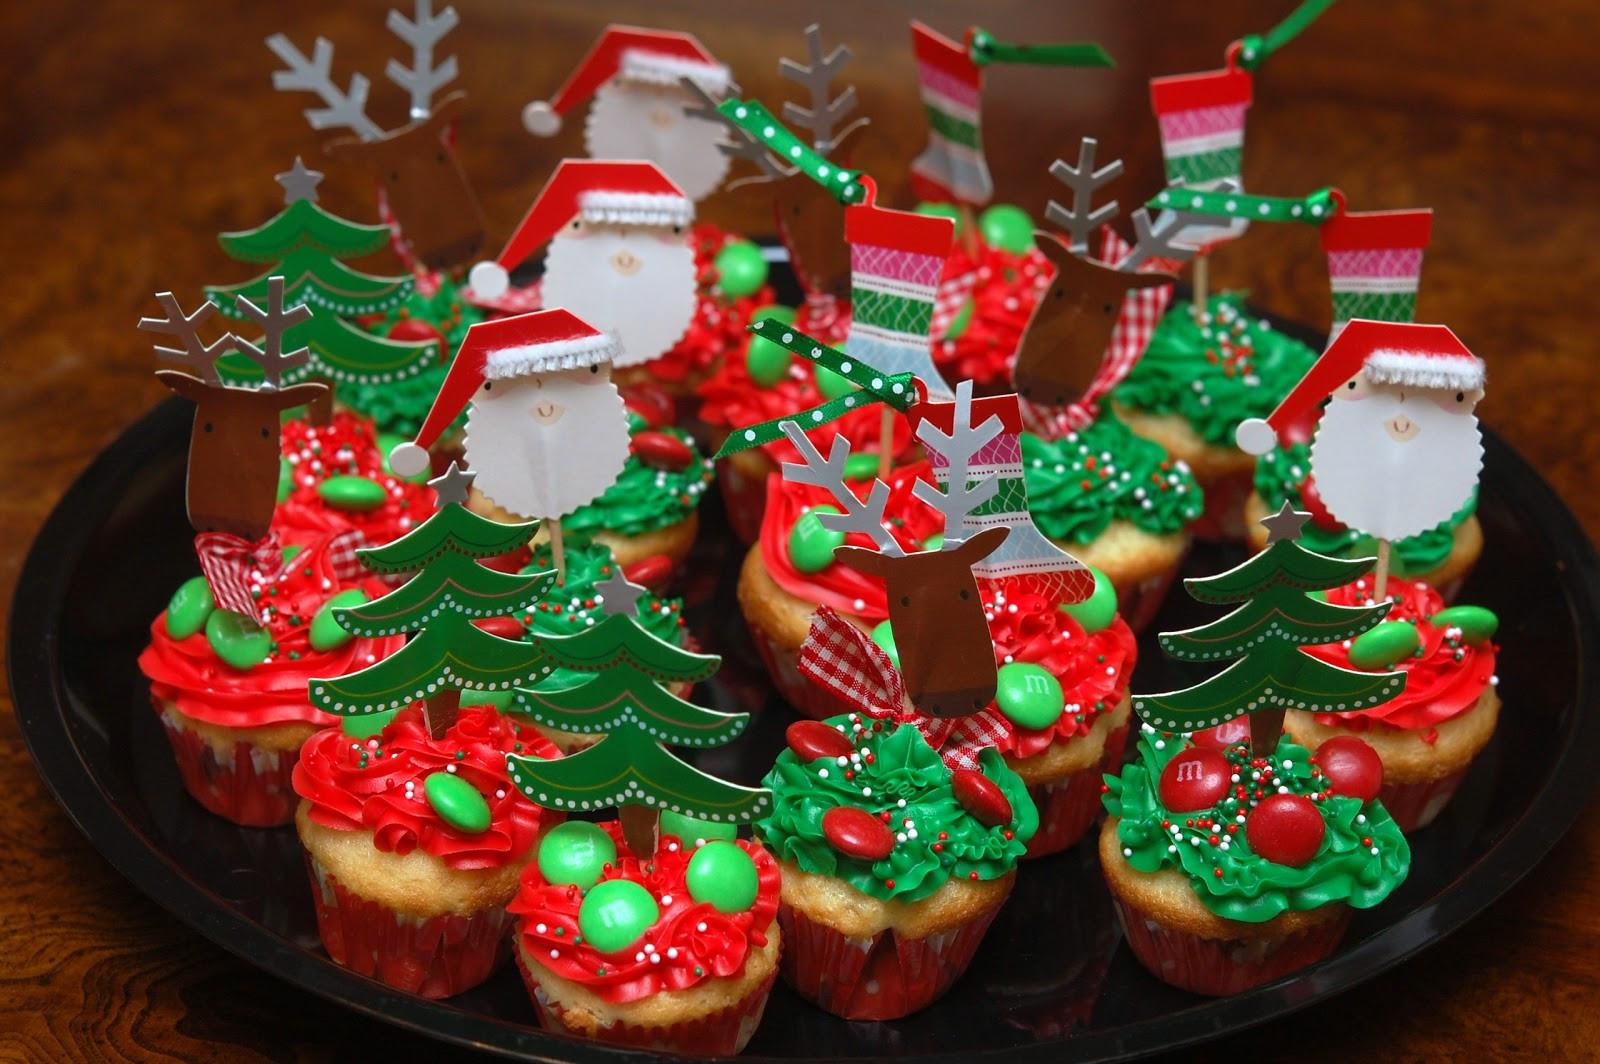 Mini Christmas Cup Cakes  MINI HOLIDAY CUPCAKES Hugs and Cookies XOXO